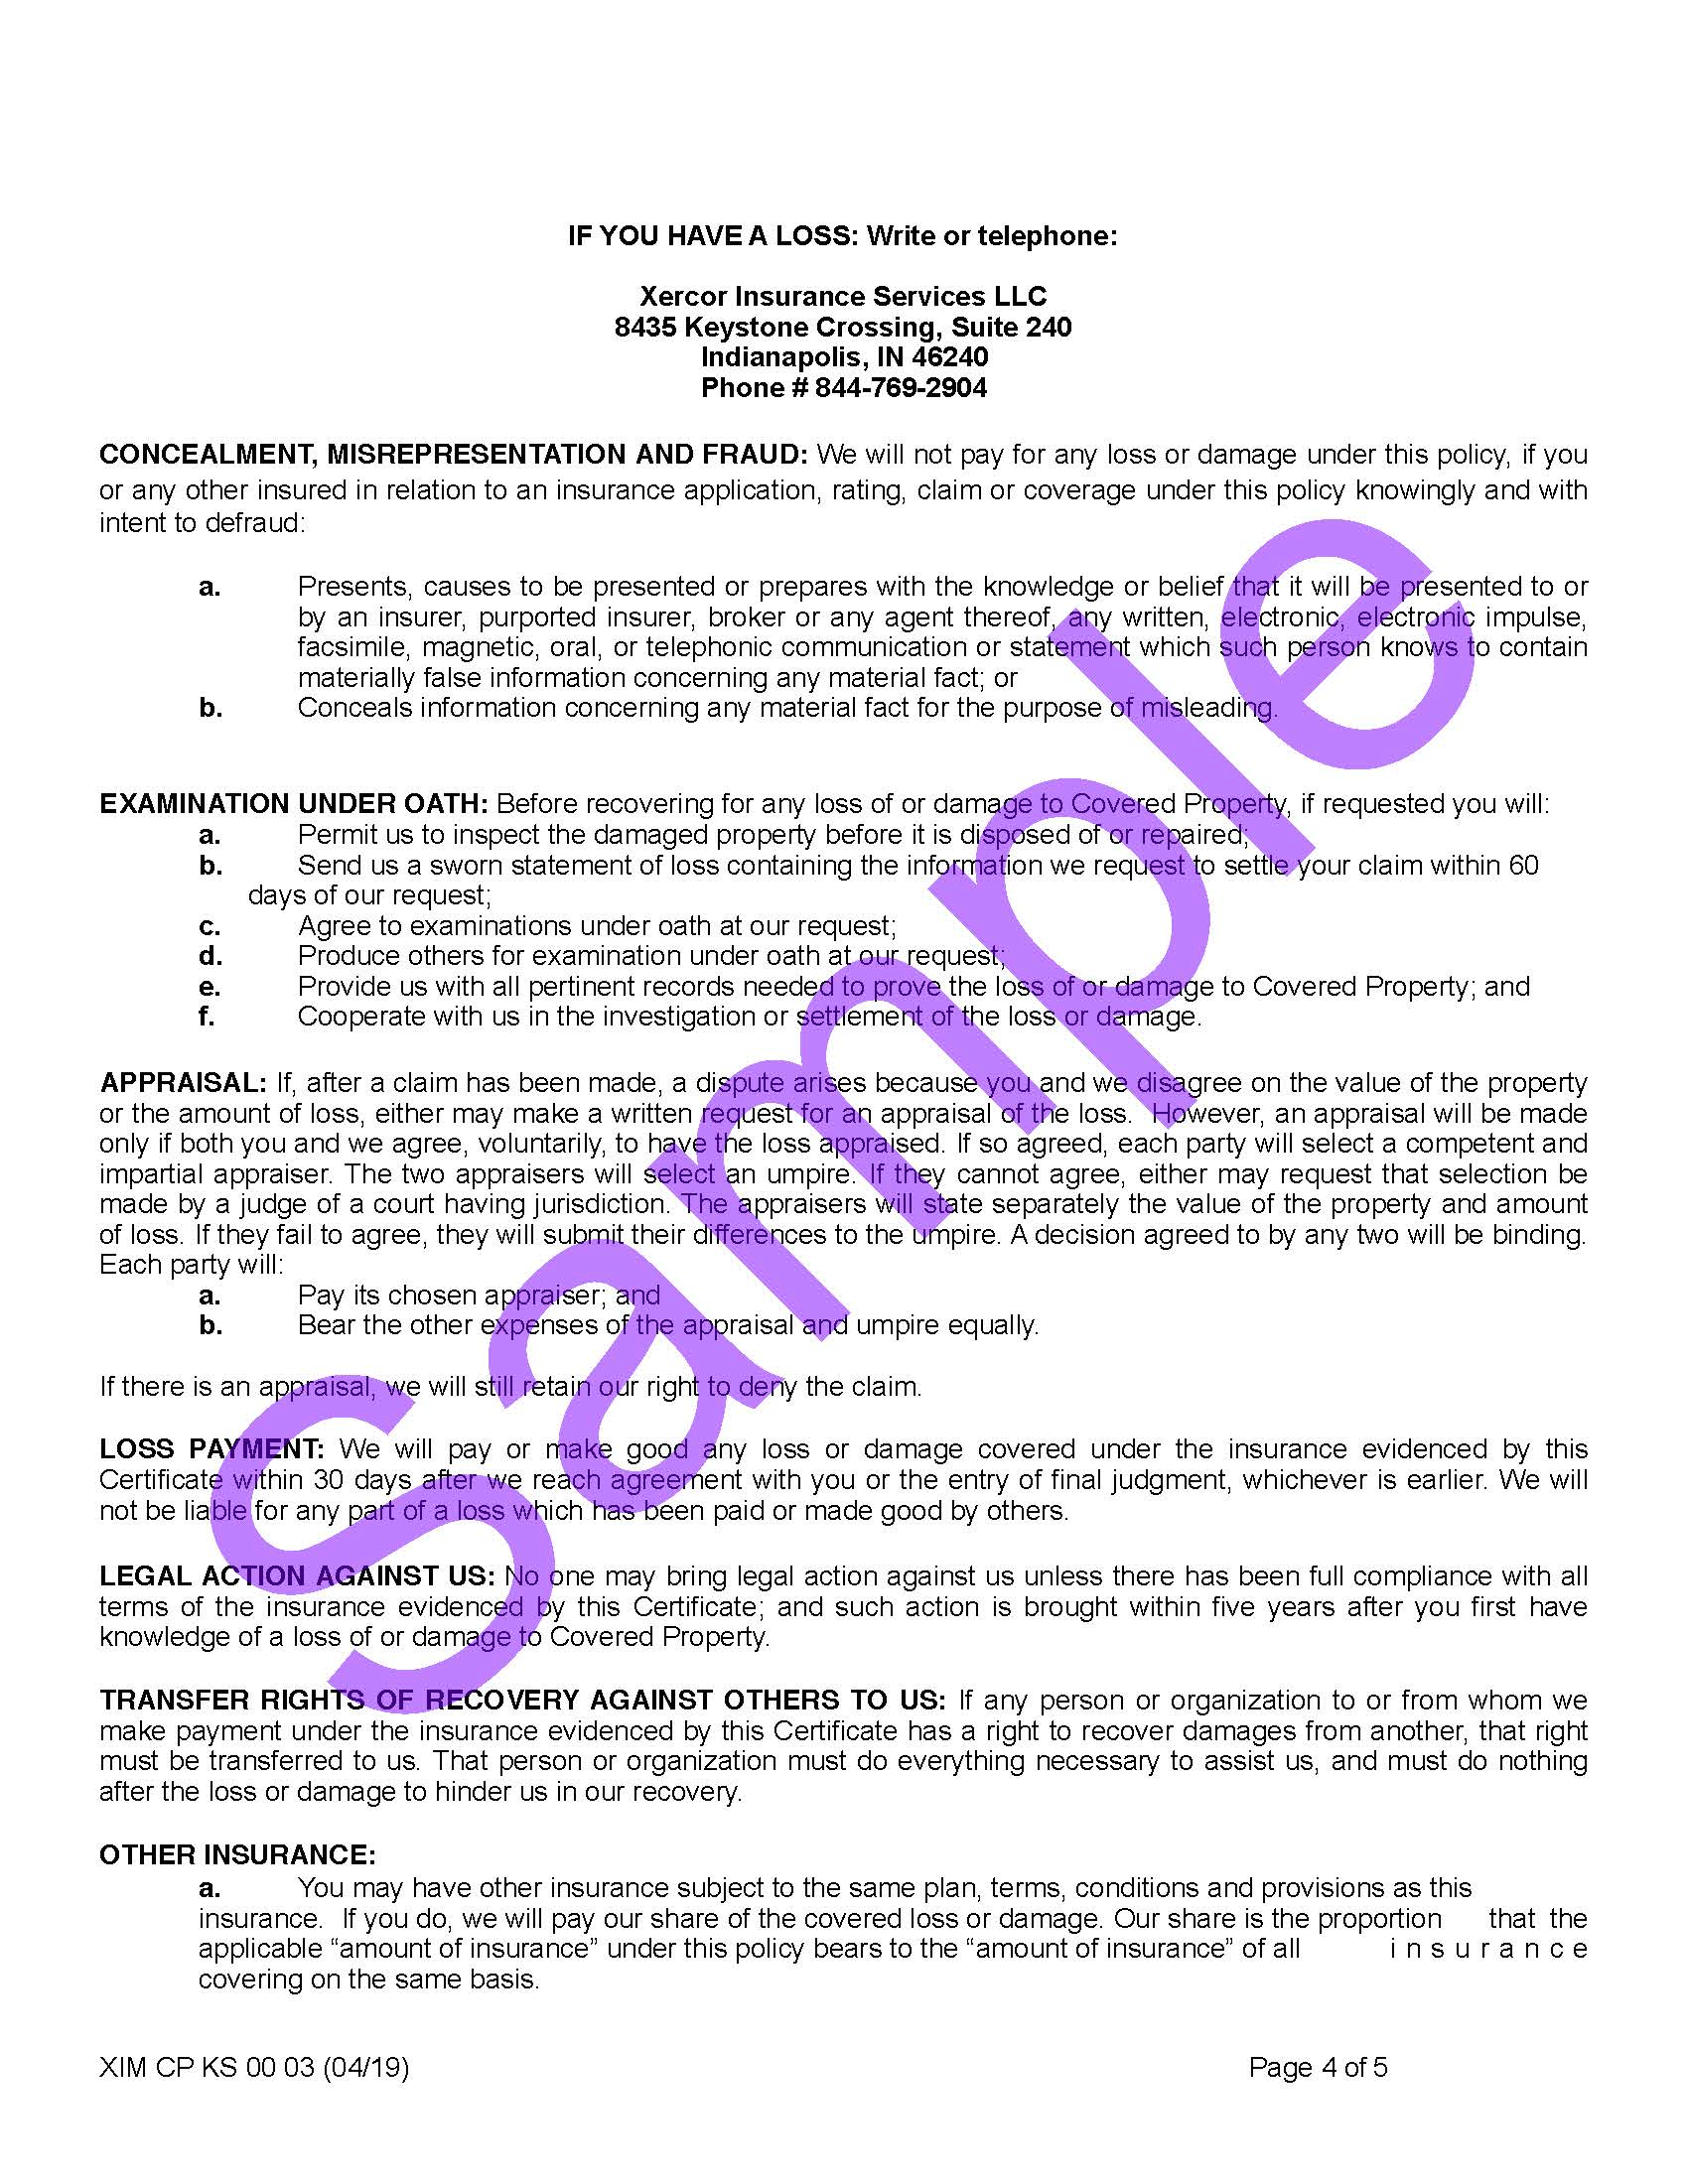 XIM CP KS 00 03 04 19 Kansas Certificate of InsuranceSample_Page_4.jpg